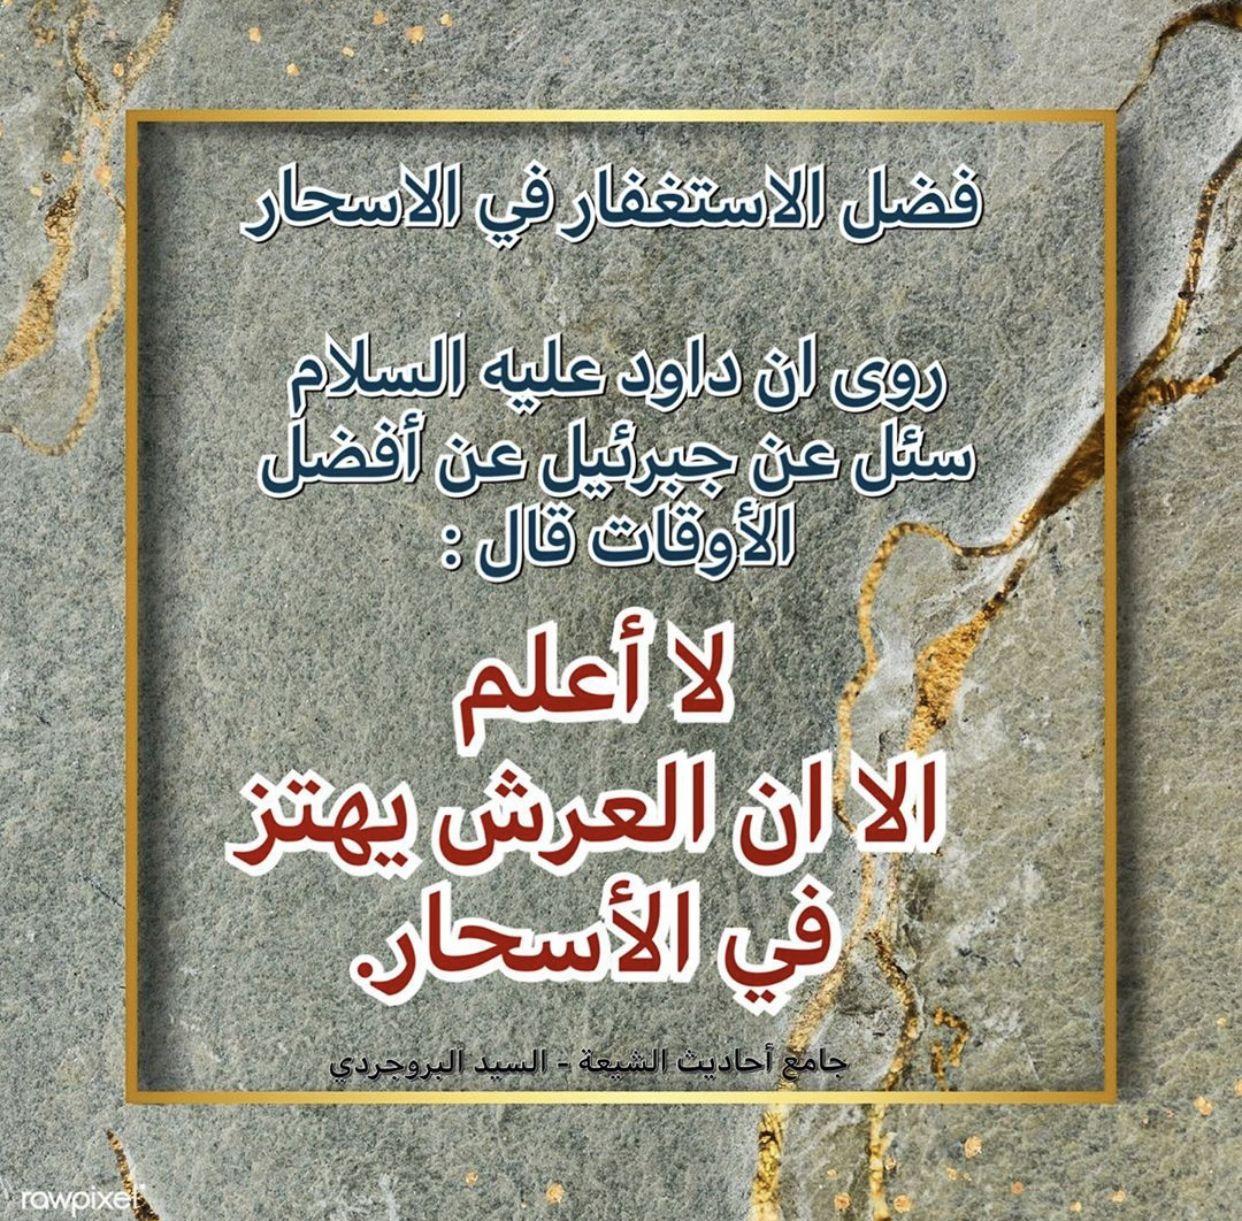 Pin By Aldahan On احاديث ا هل الب يت ص Novelty Sign Novelty Decor